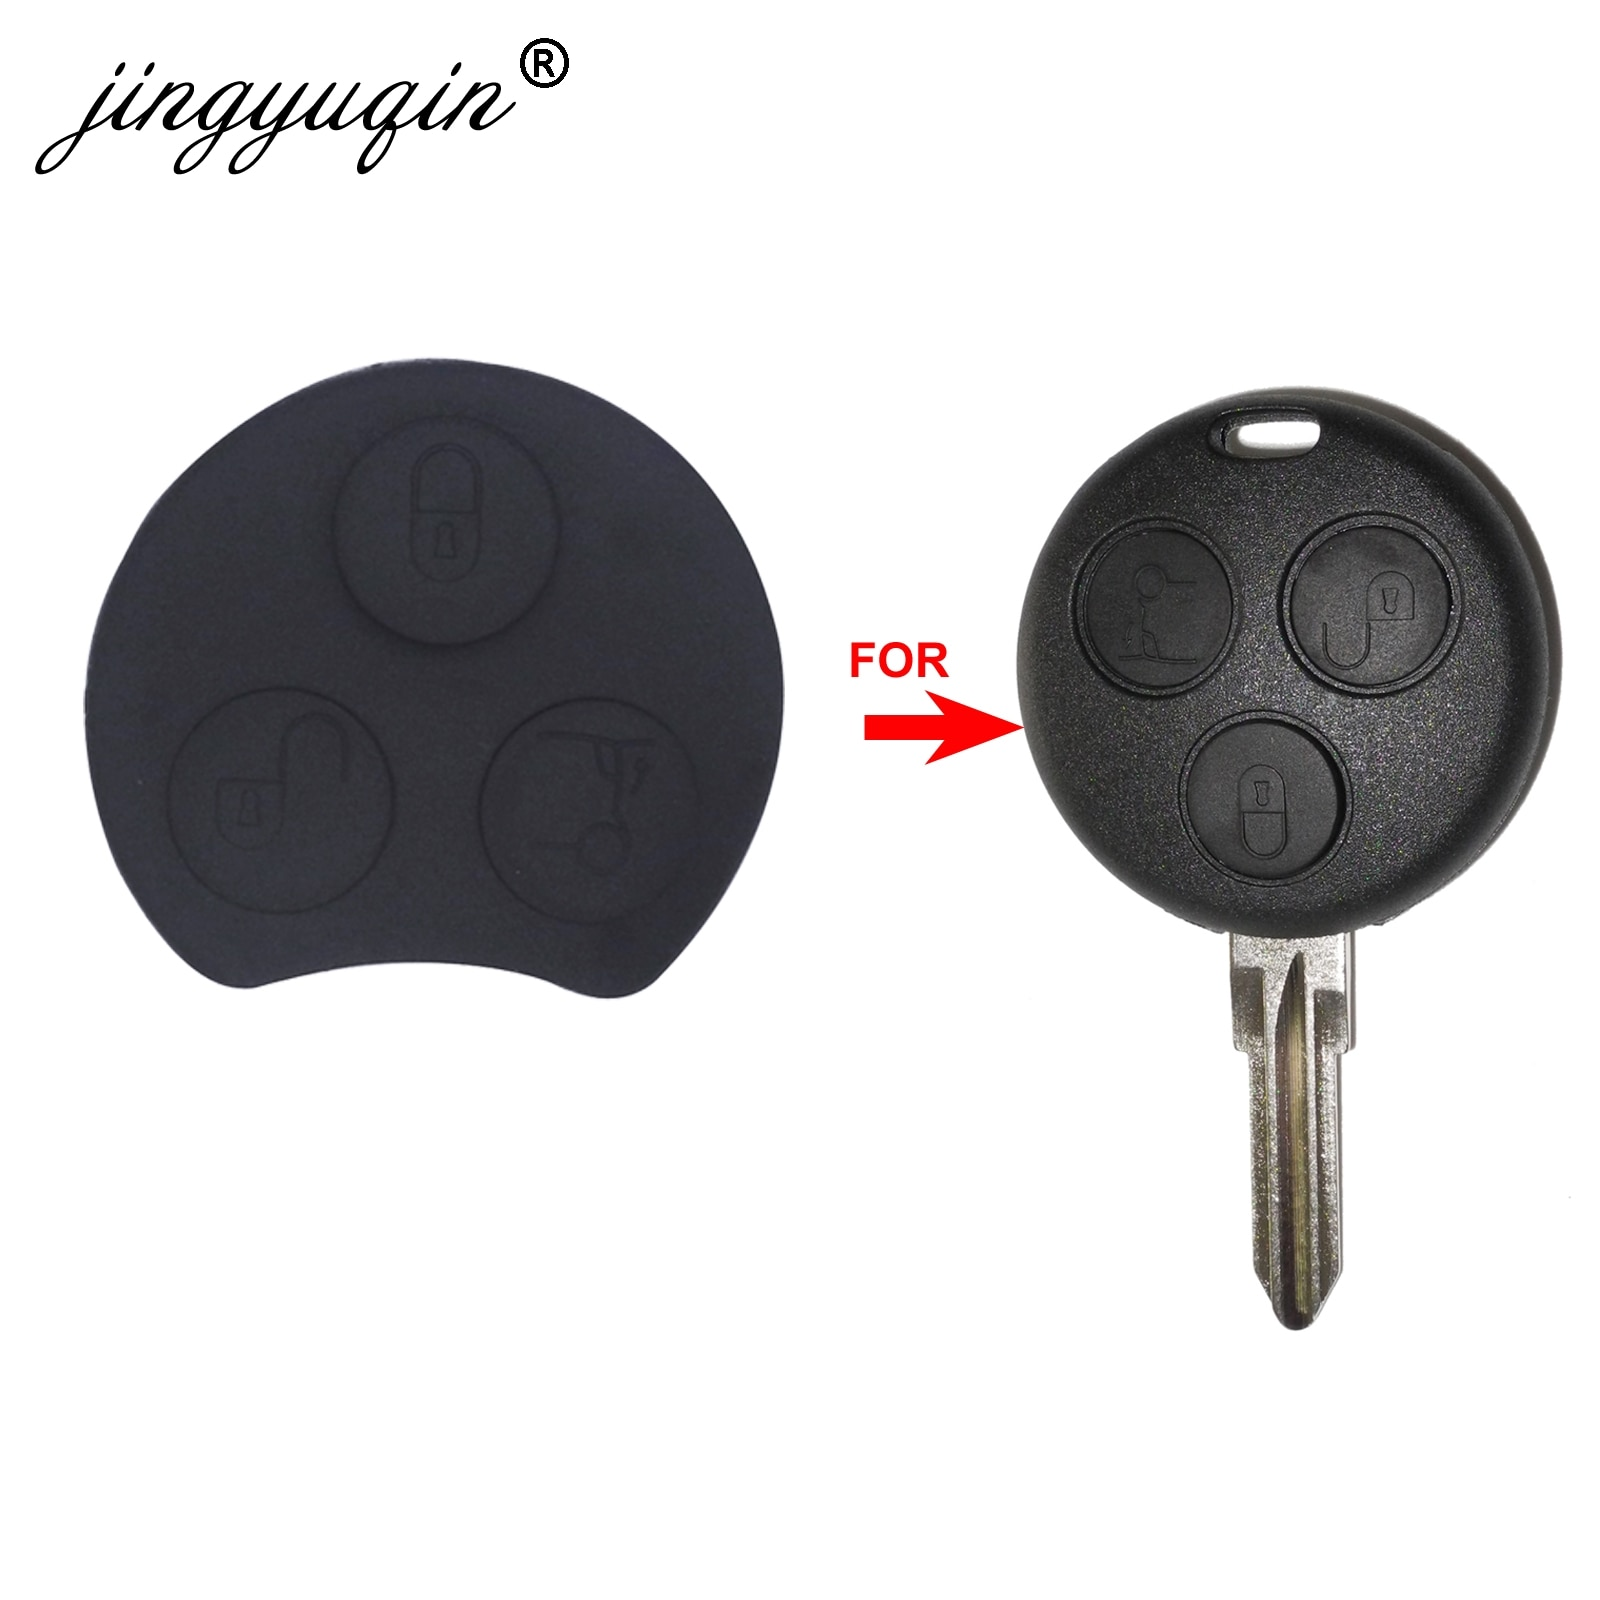 Lote de botones jingyuqin para Mercedes Benz Smart Two 450 Mayitr, funda para mando a distancia, reemplazo de almohadilla